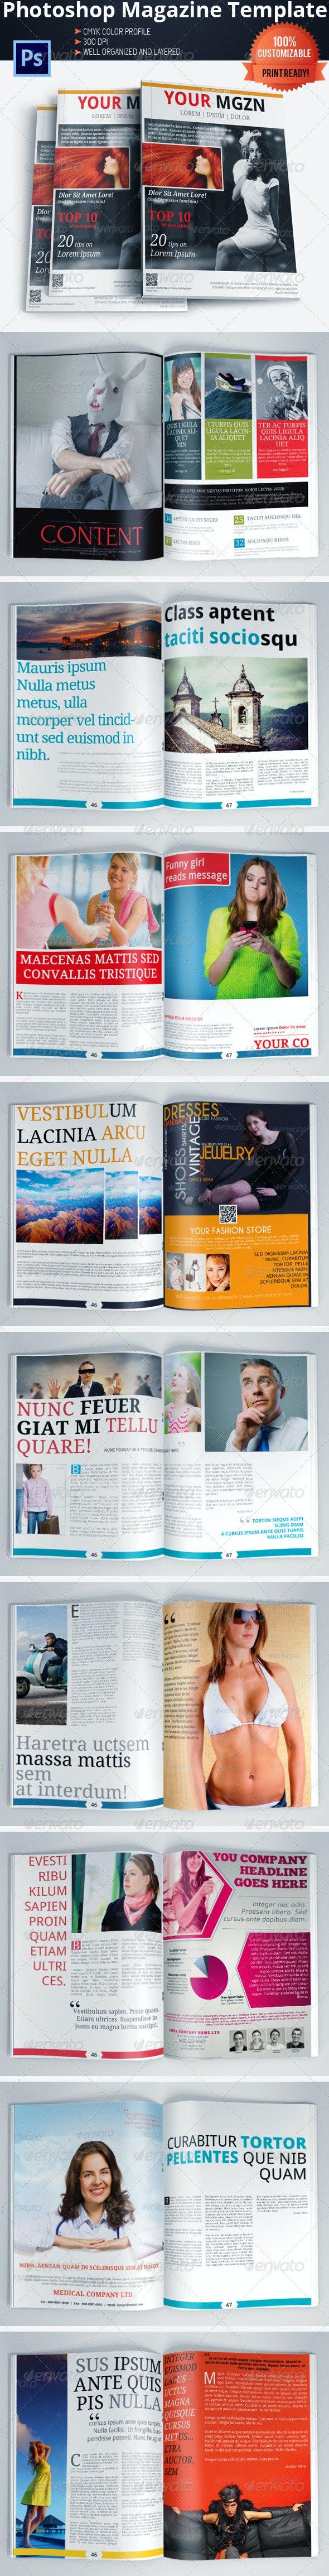 Multipurpose Magazine Template (Photoshop PSD) - Magazines Print Templates